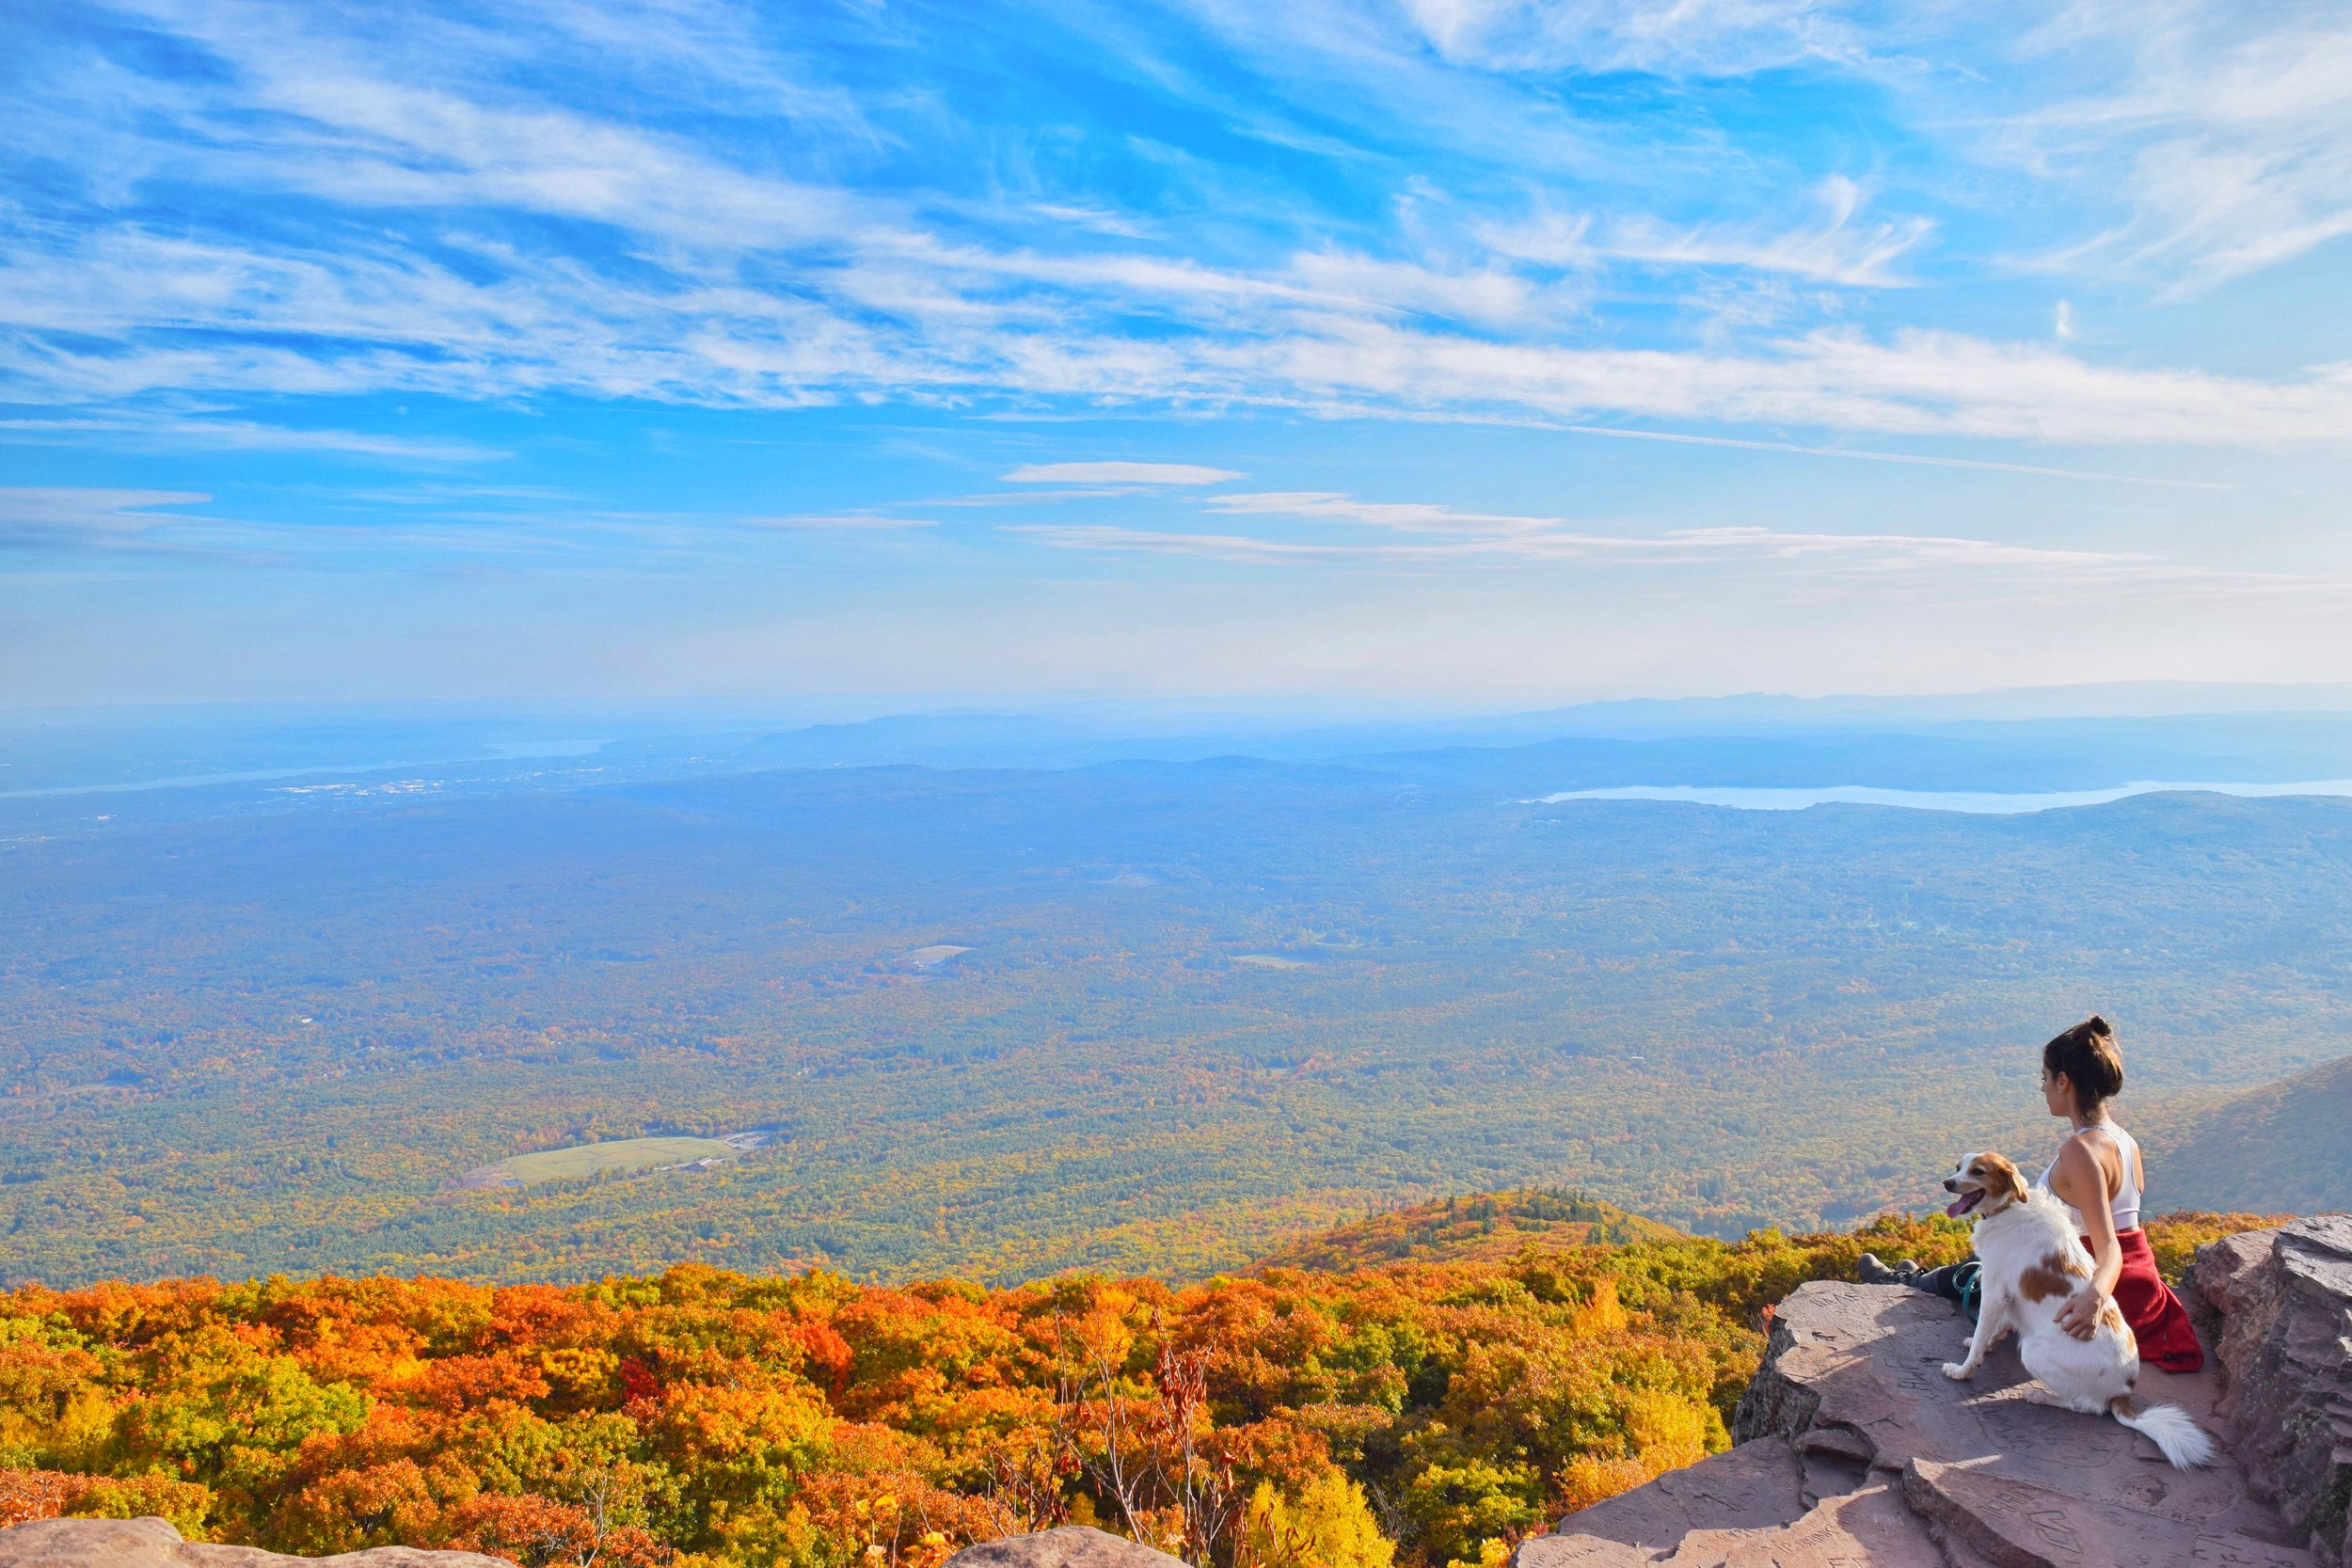 hiking-catskills-overlook-mountain.JPG